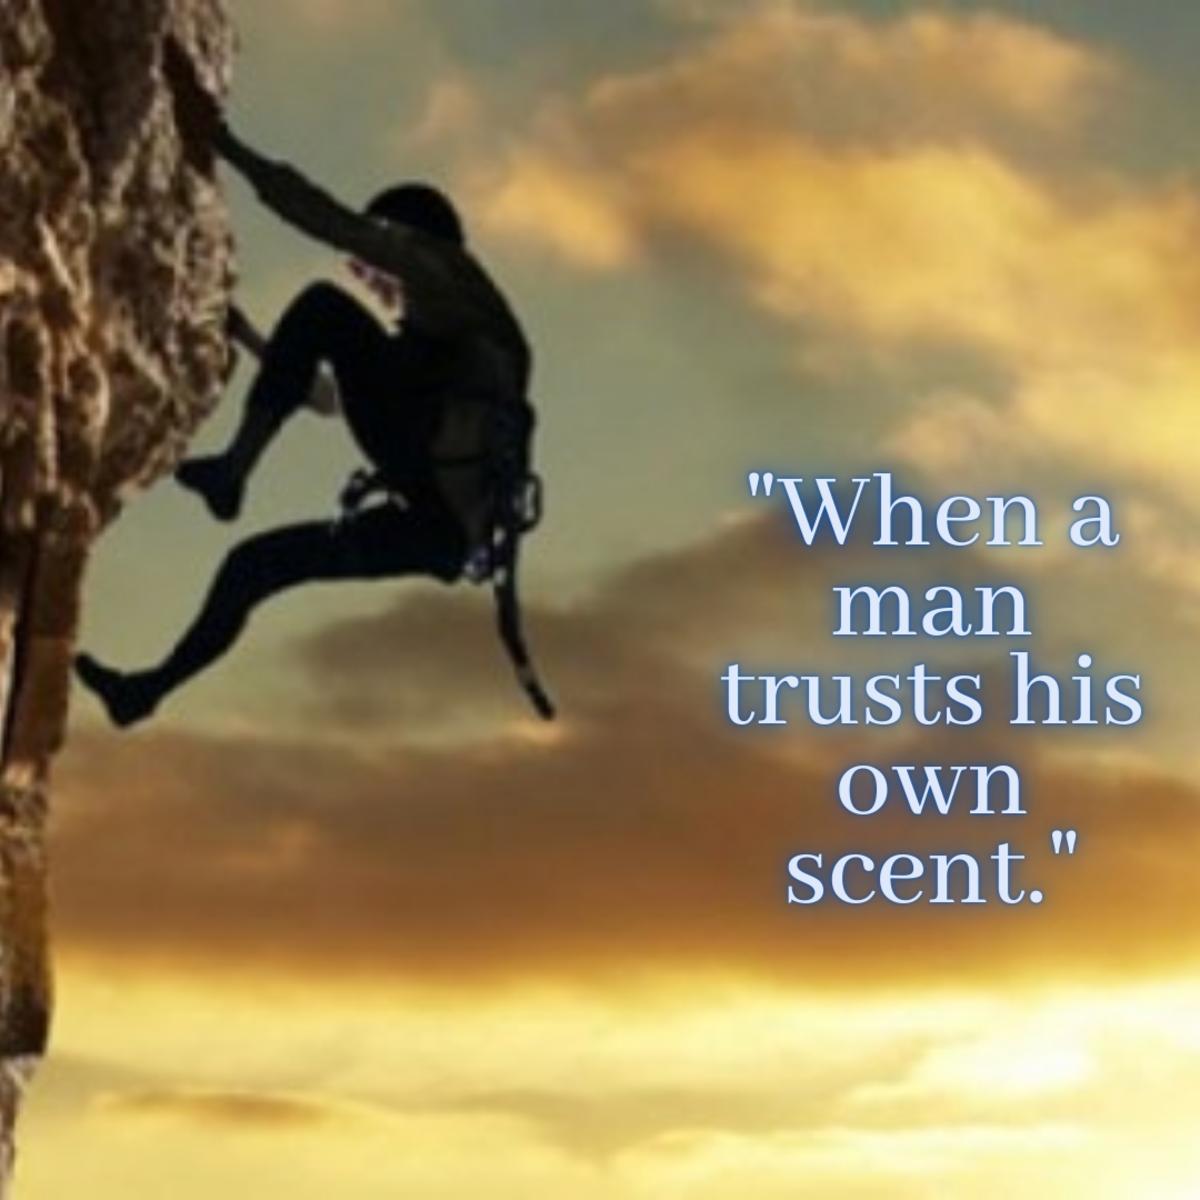 scent-of-a-man-a-sense-of-masculine-elegance